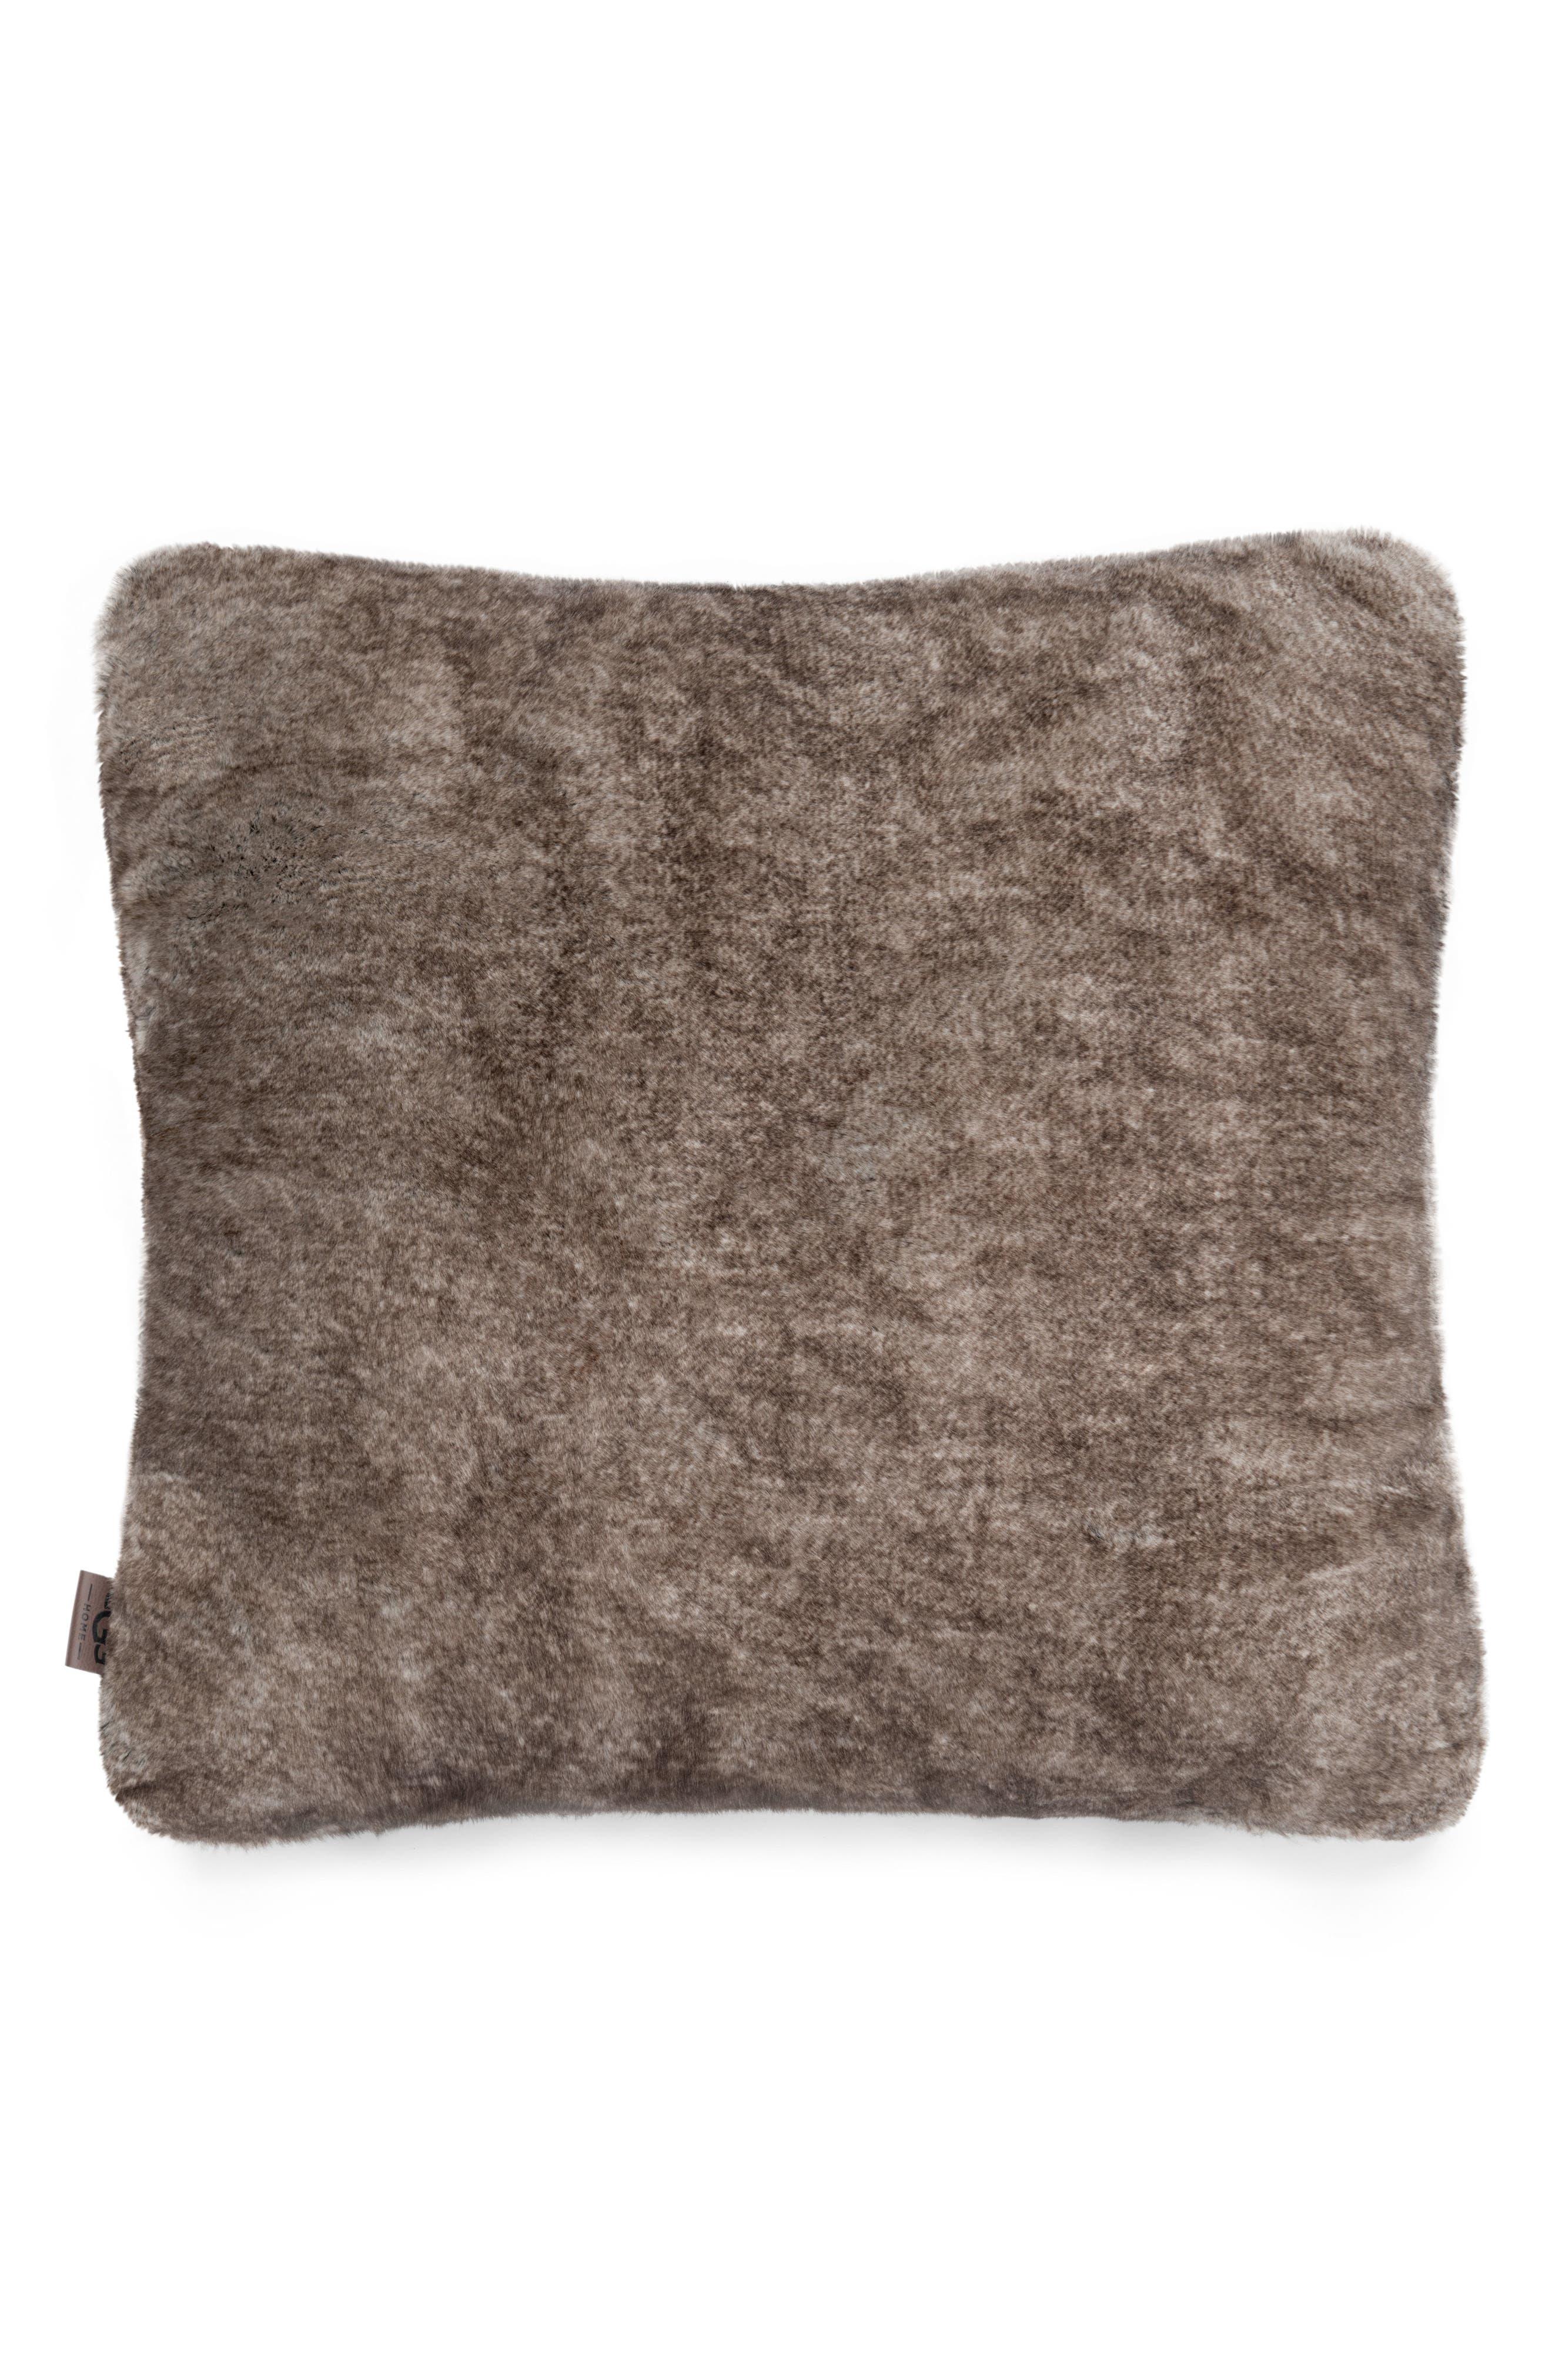 Dream Faux Fur Pillow,                             Main thumbnail 1, color,                             Cocoa